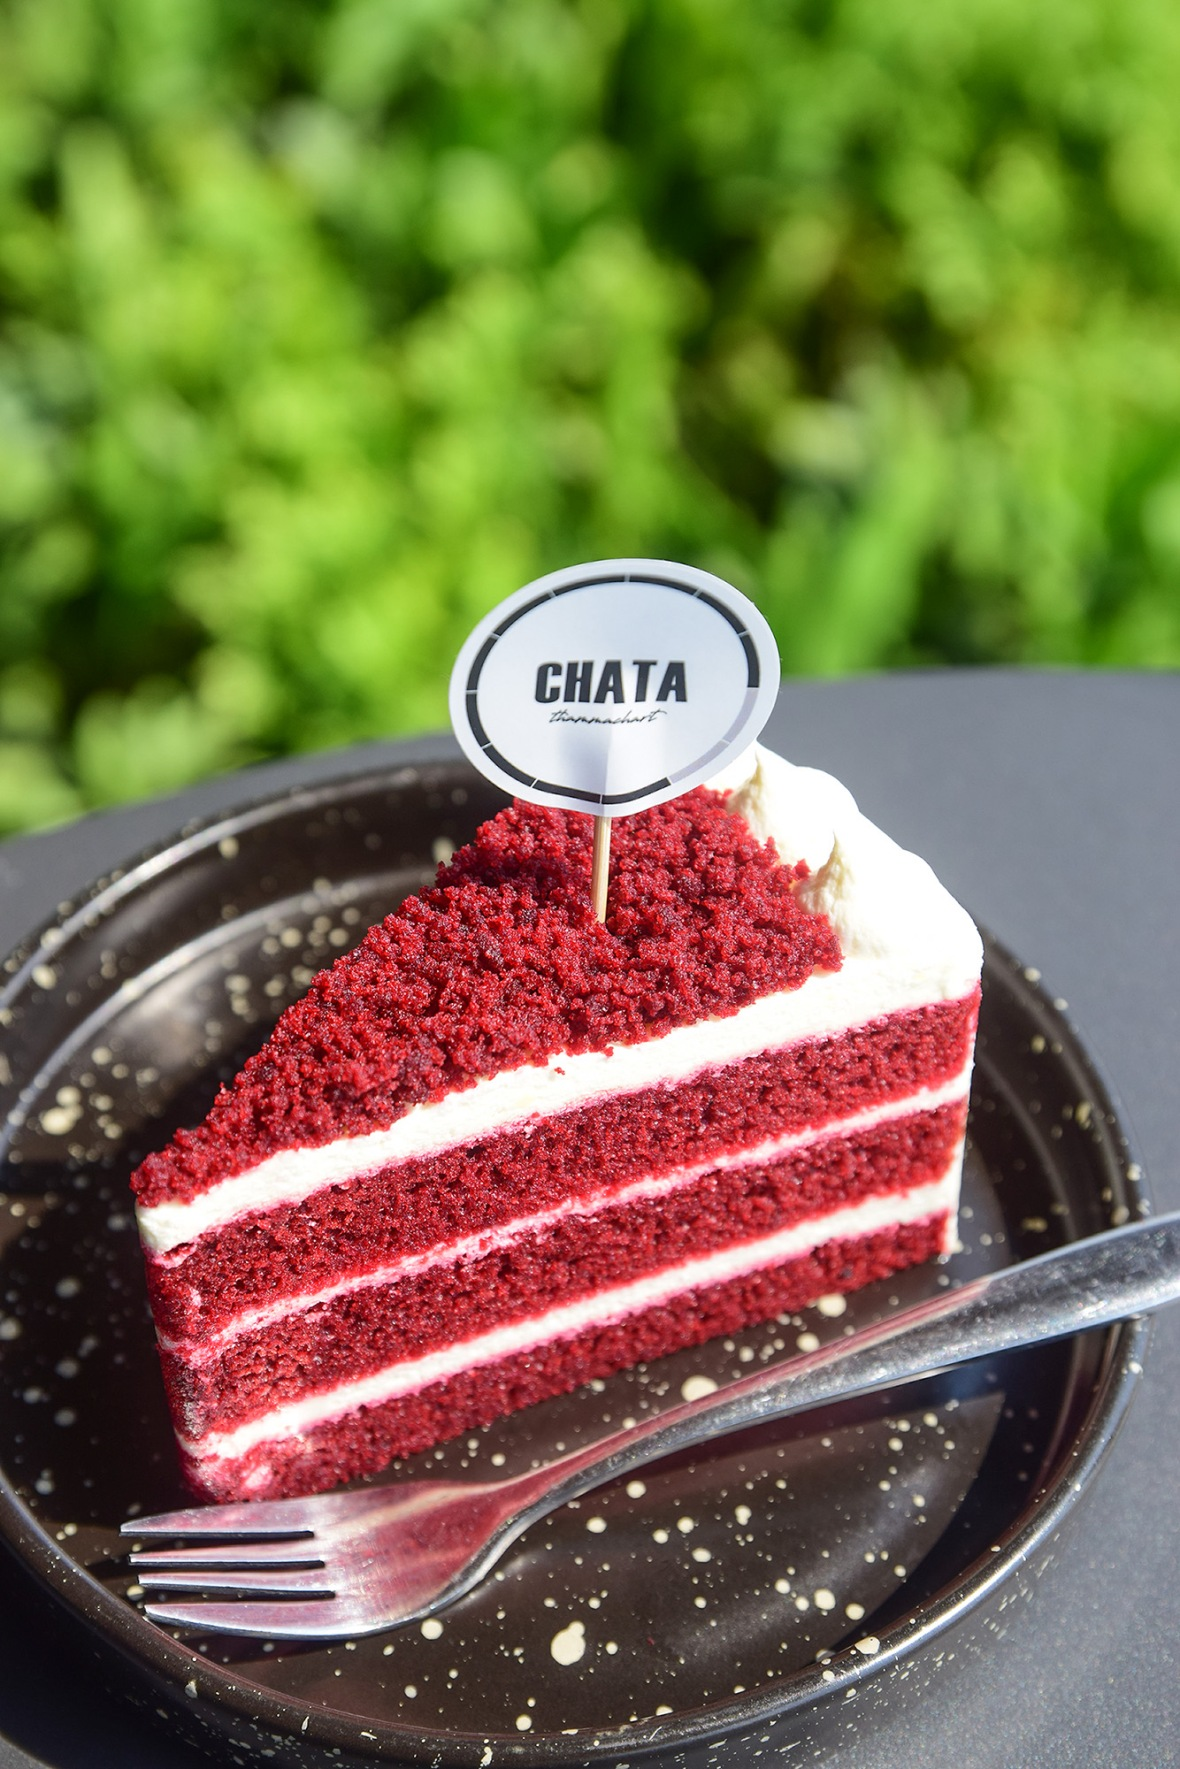 Chata thammachart Cafe&Bistro (38)